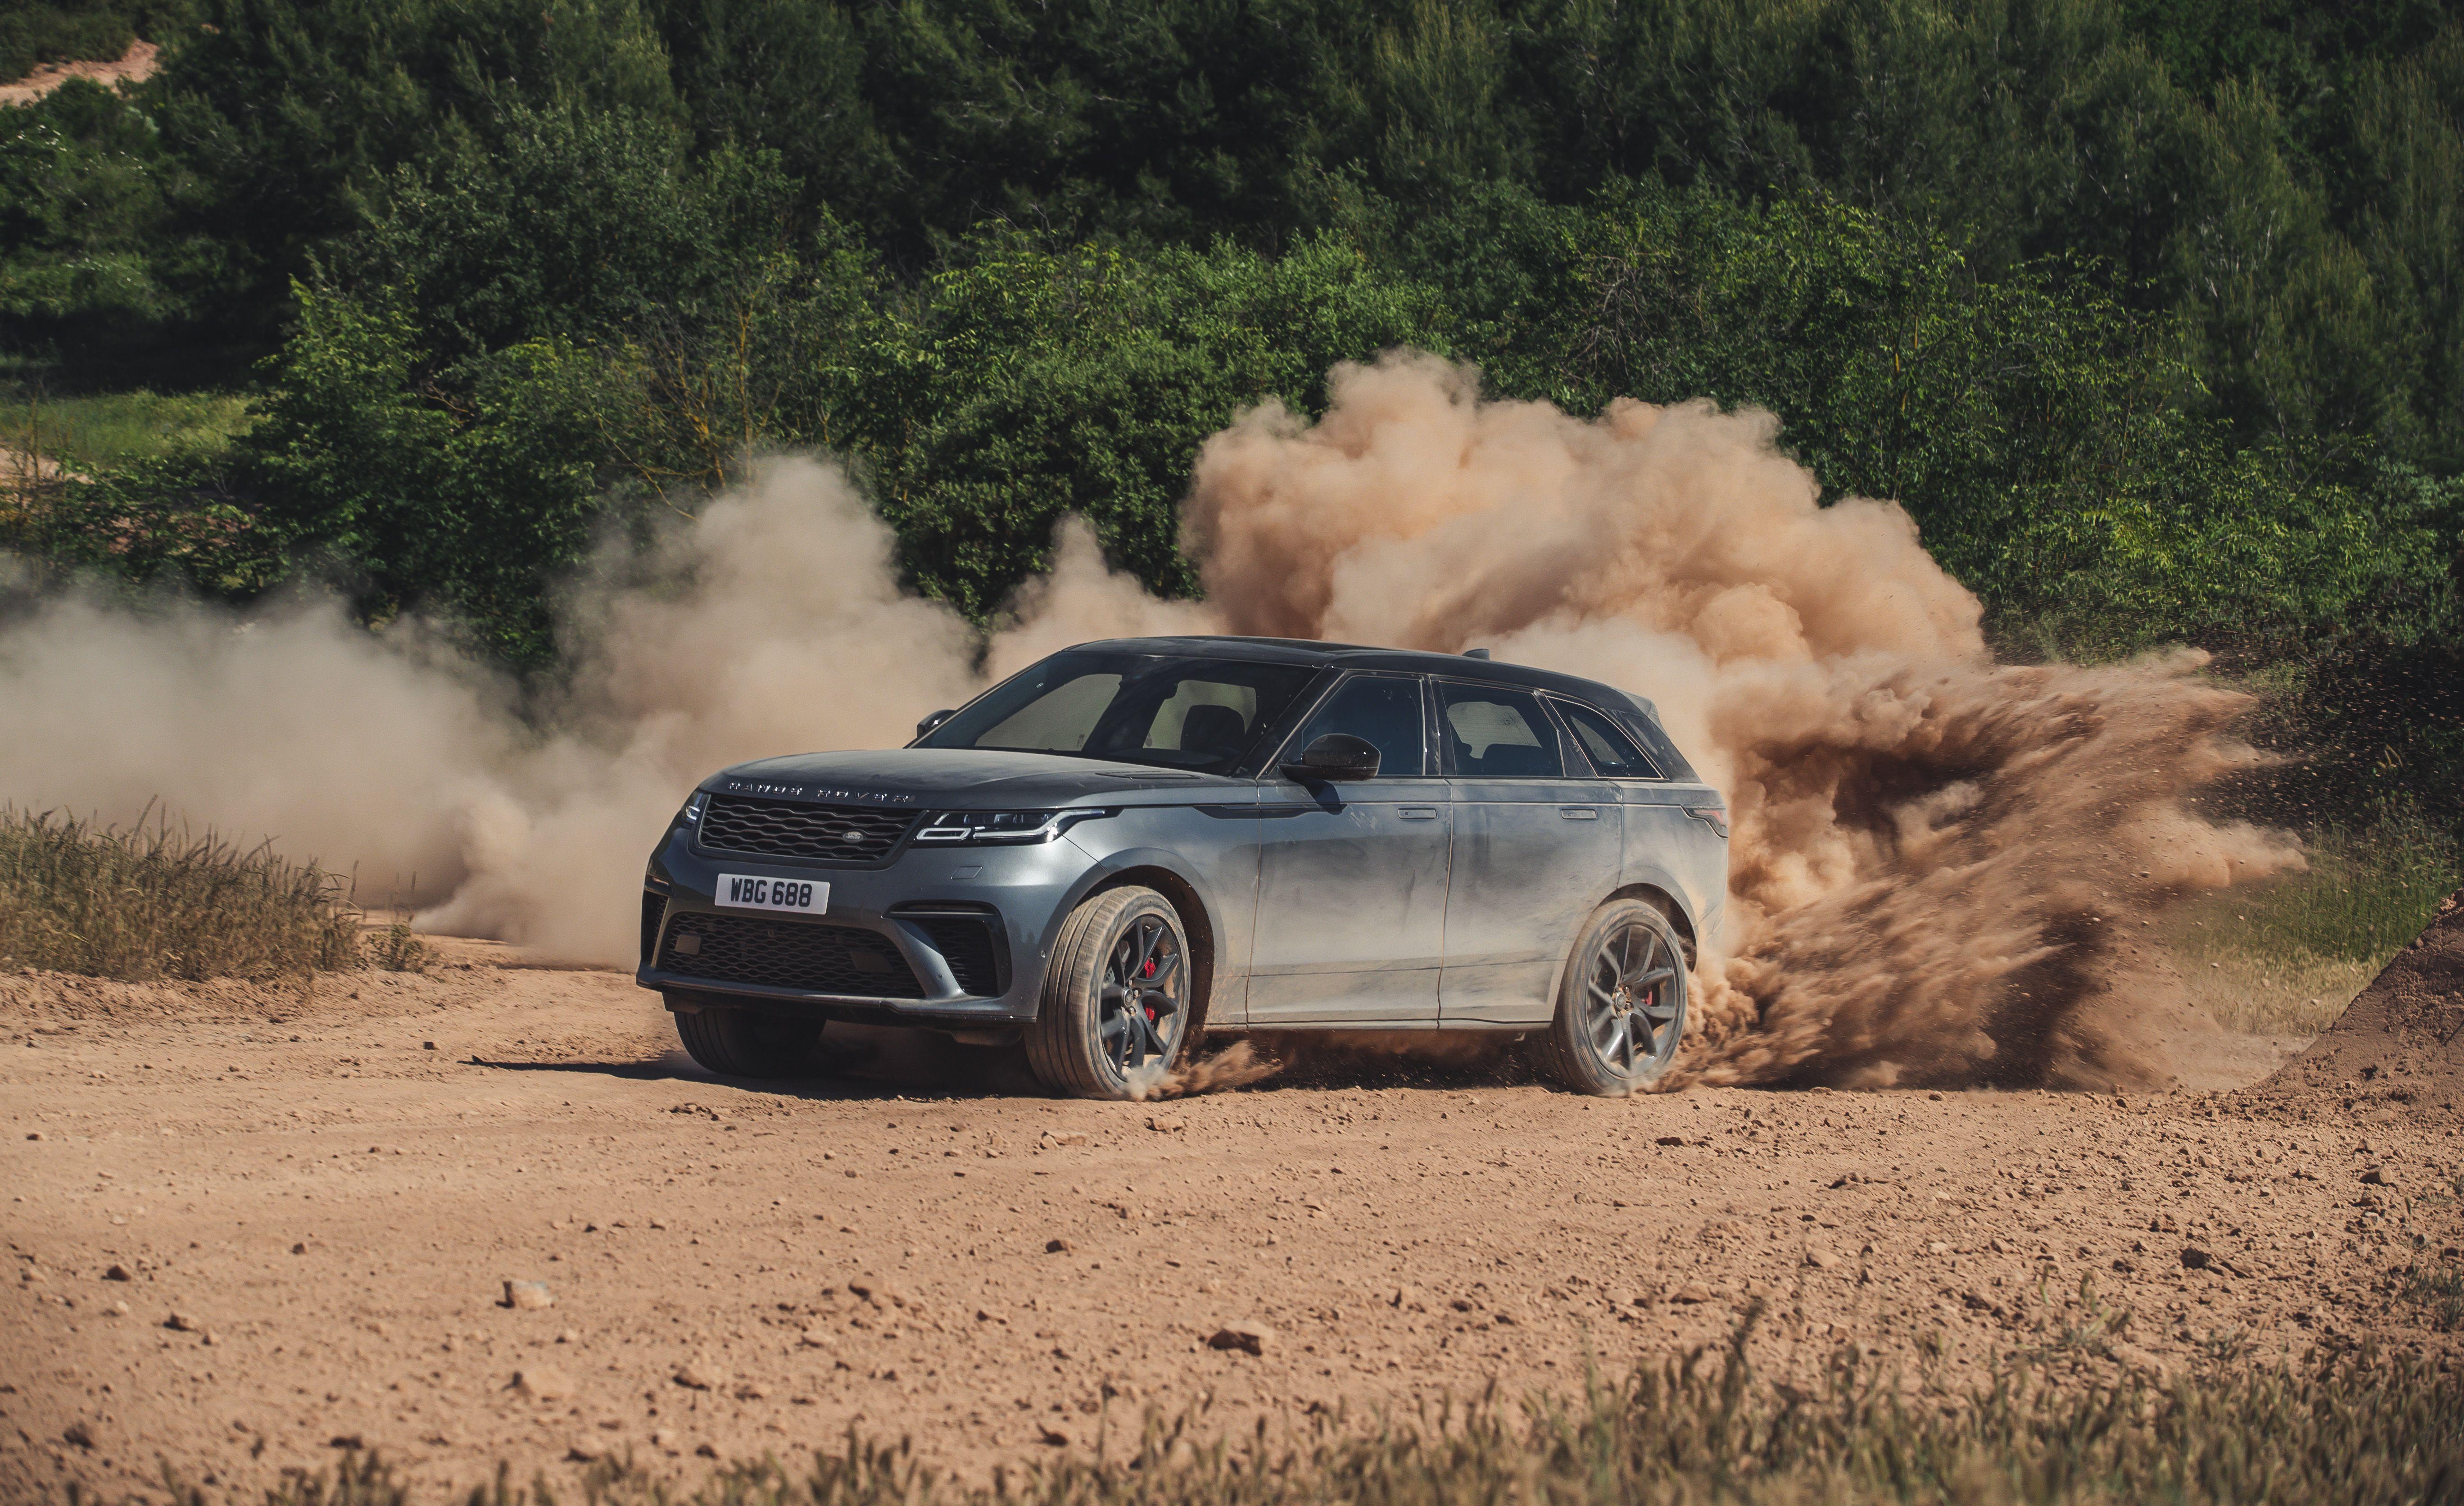 Best Autobiographies 2020 2020 Range Rover Velar SVAutobiography Dynamic – V 8 Range Rover Velar